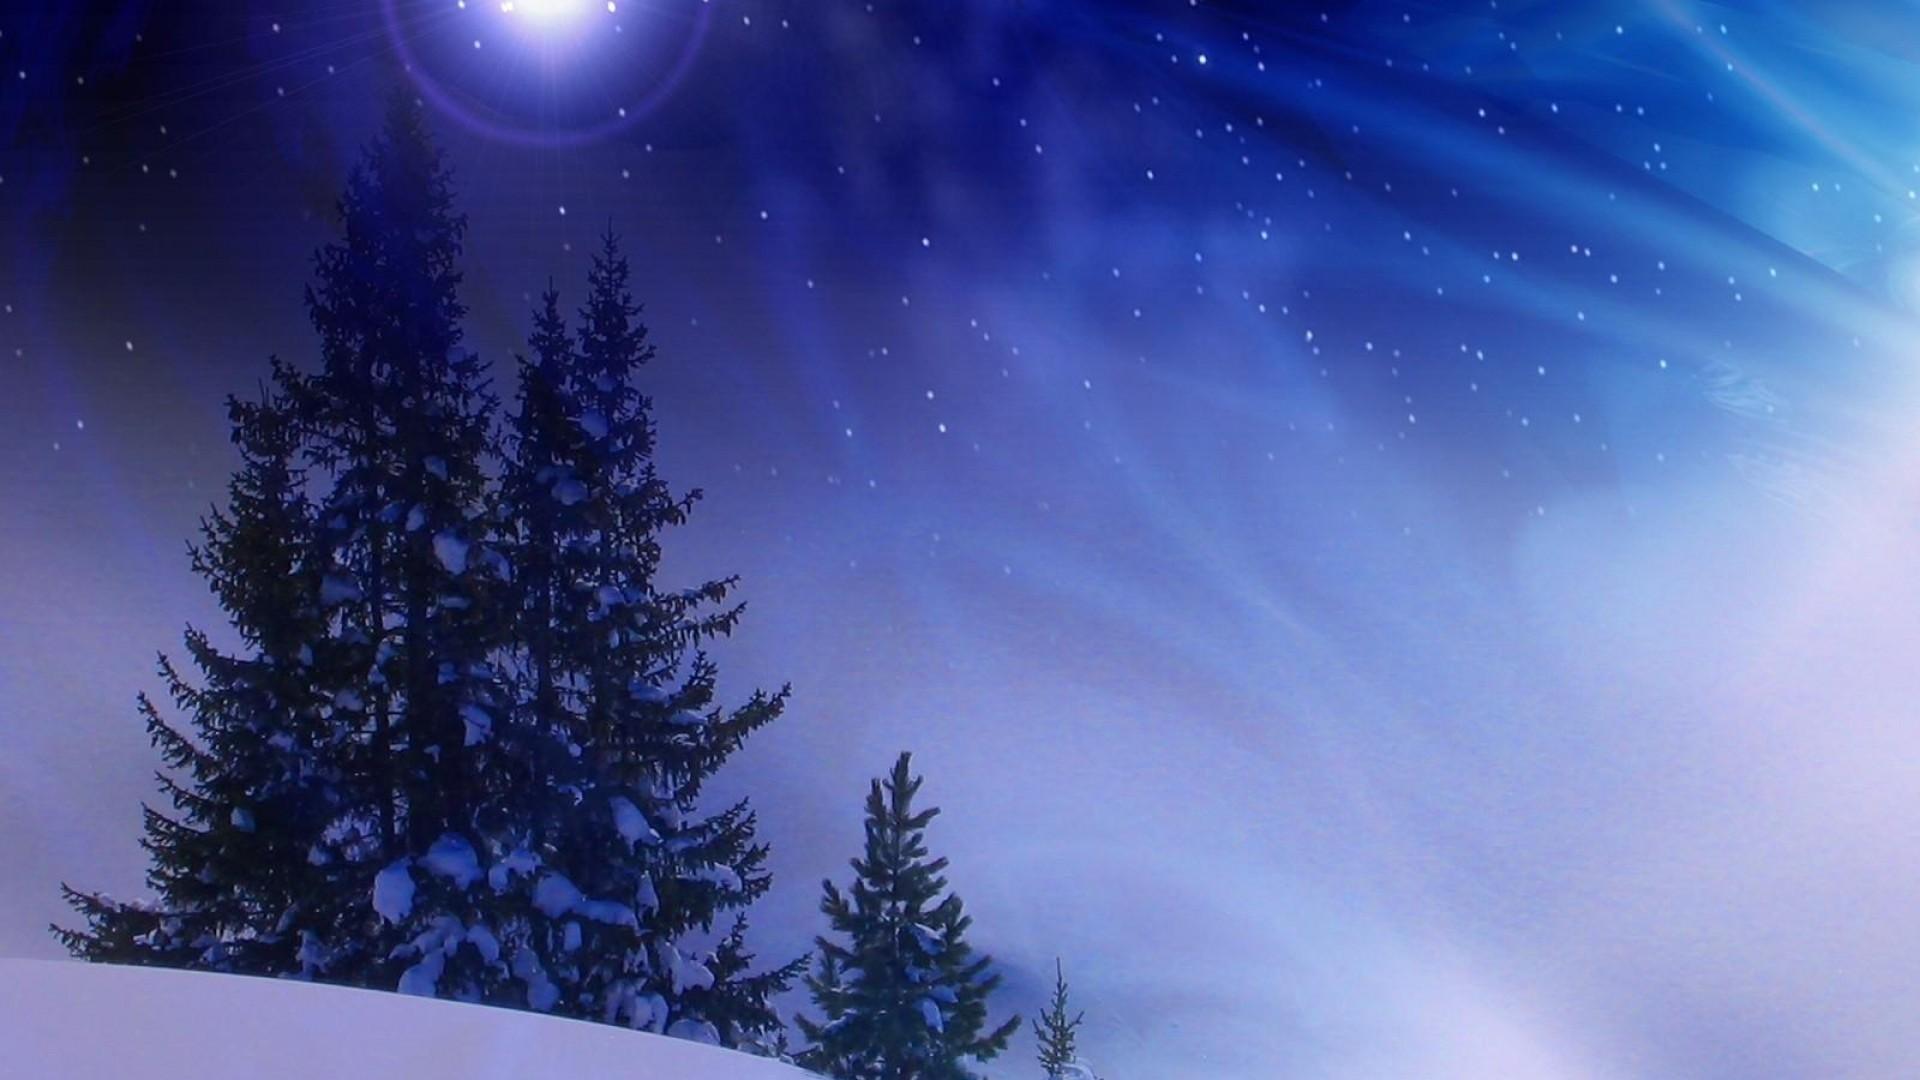 Blizzard wallpaper hd 72 images - Midnight wallpaper hd ...